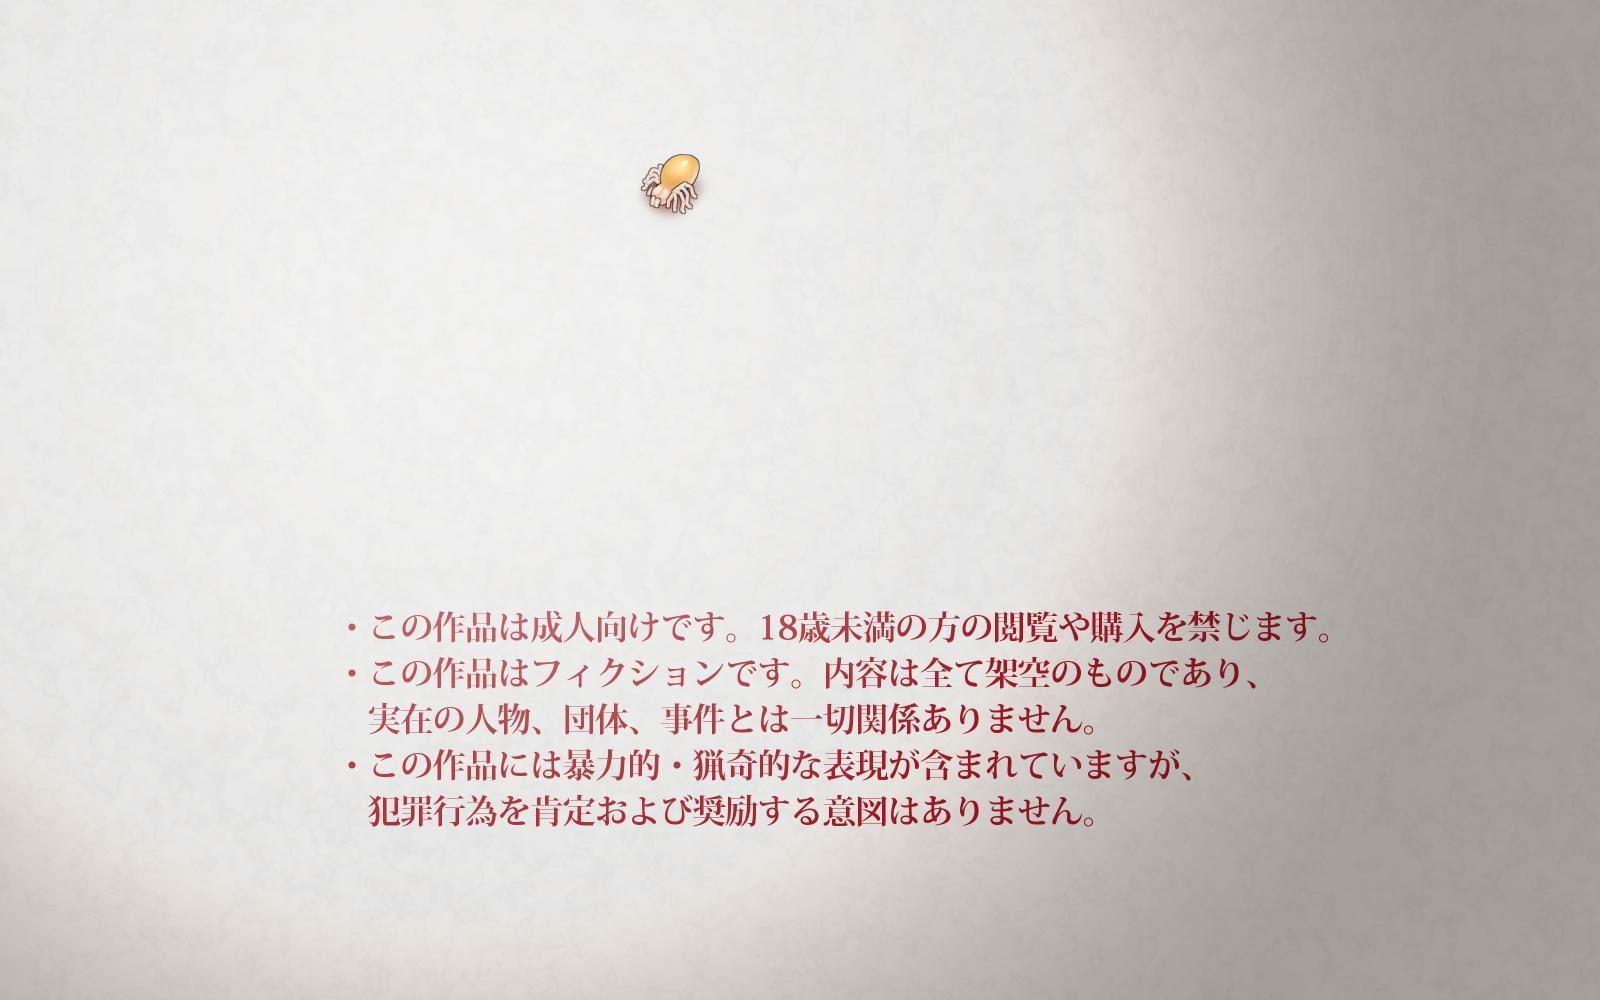 Chuukan Houkokusho 37